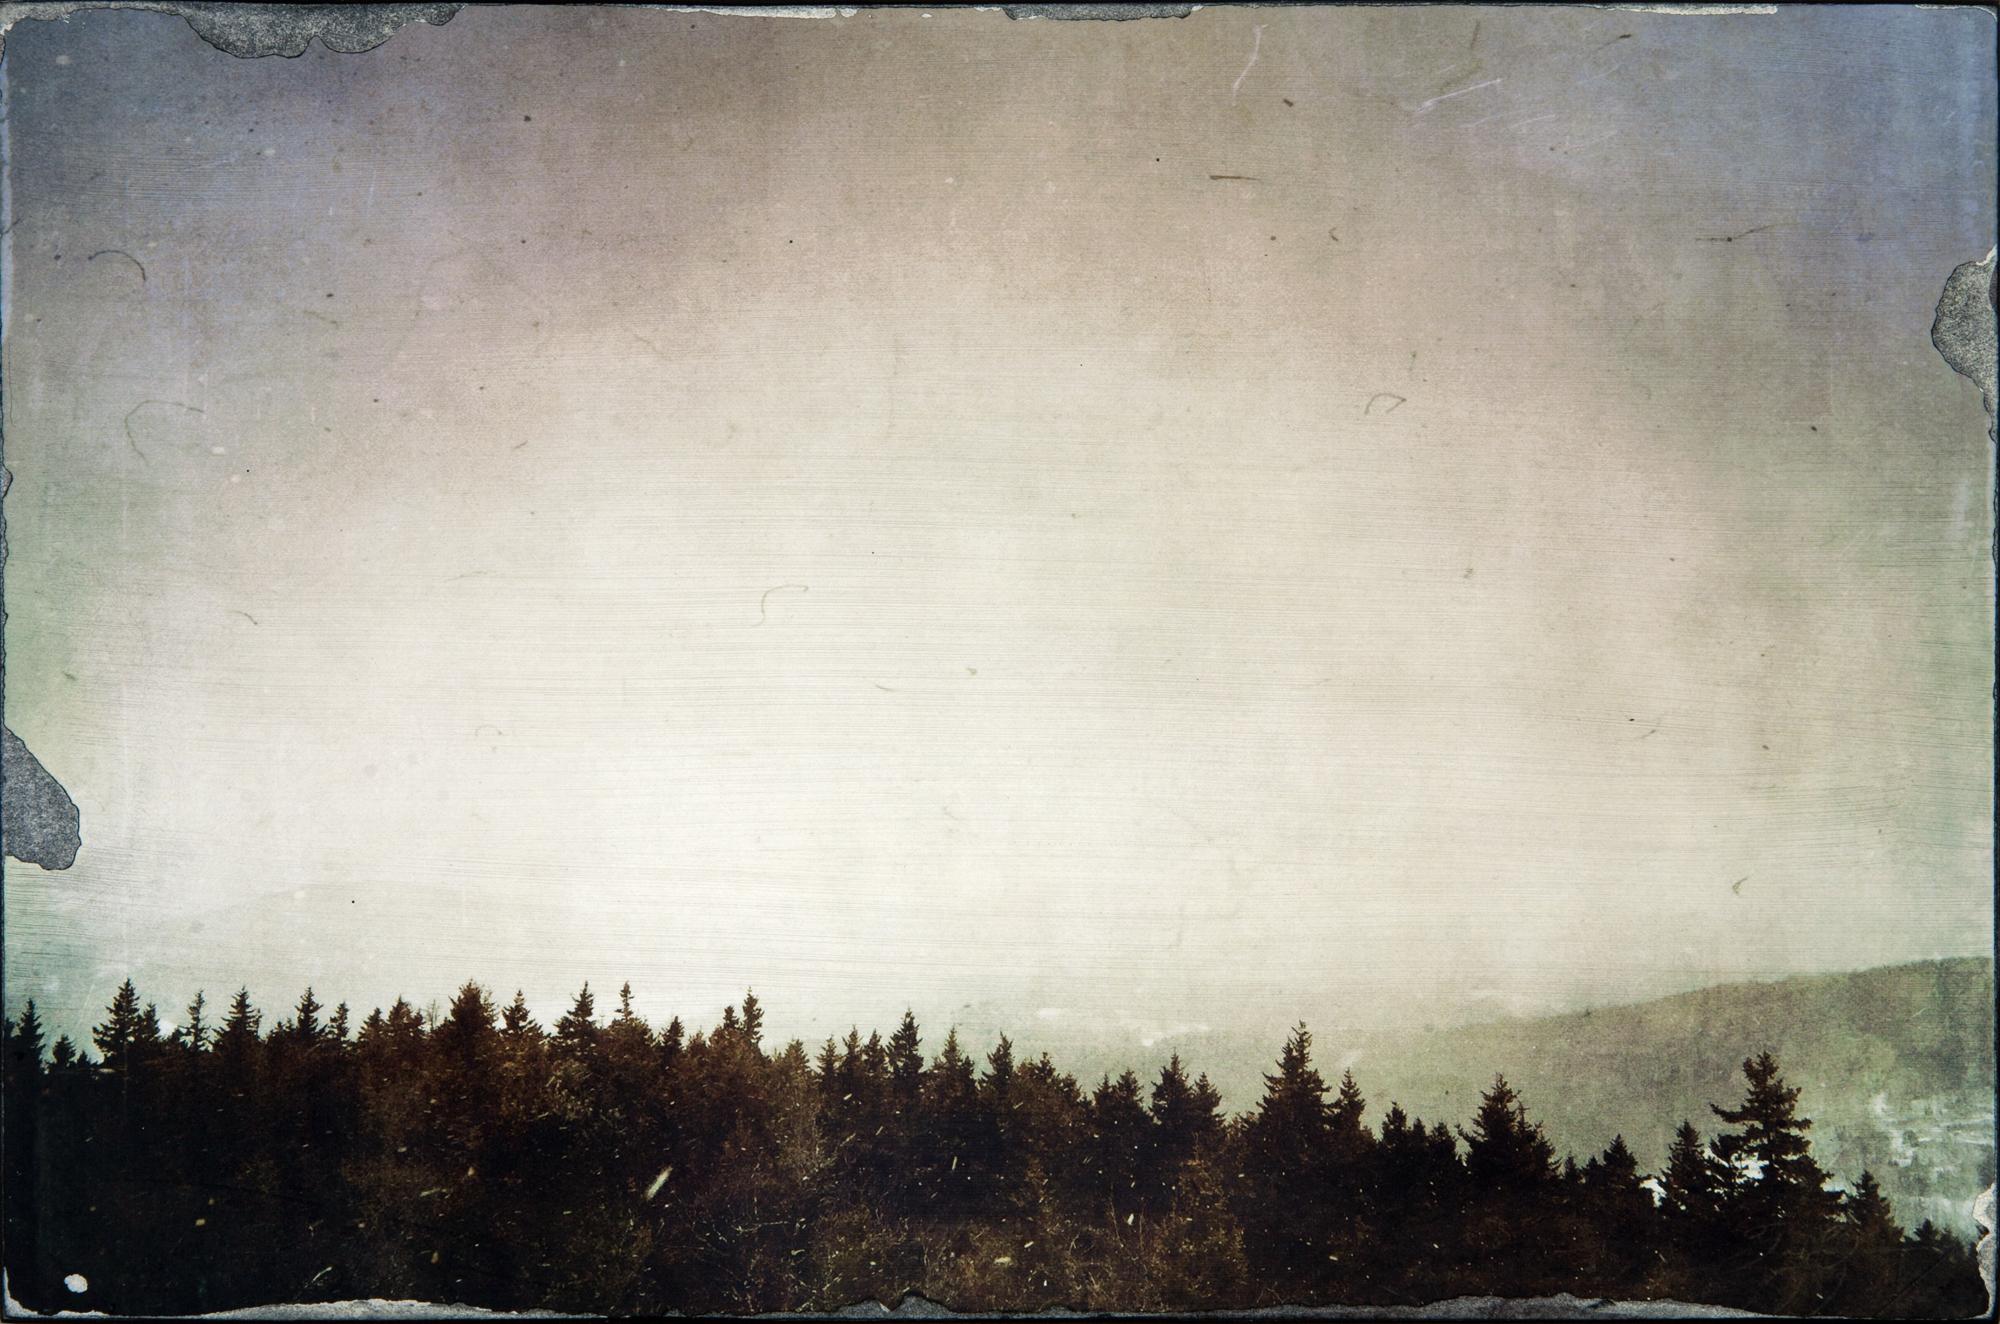 Laurence-Same View.jpg